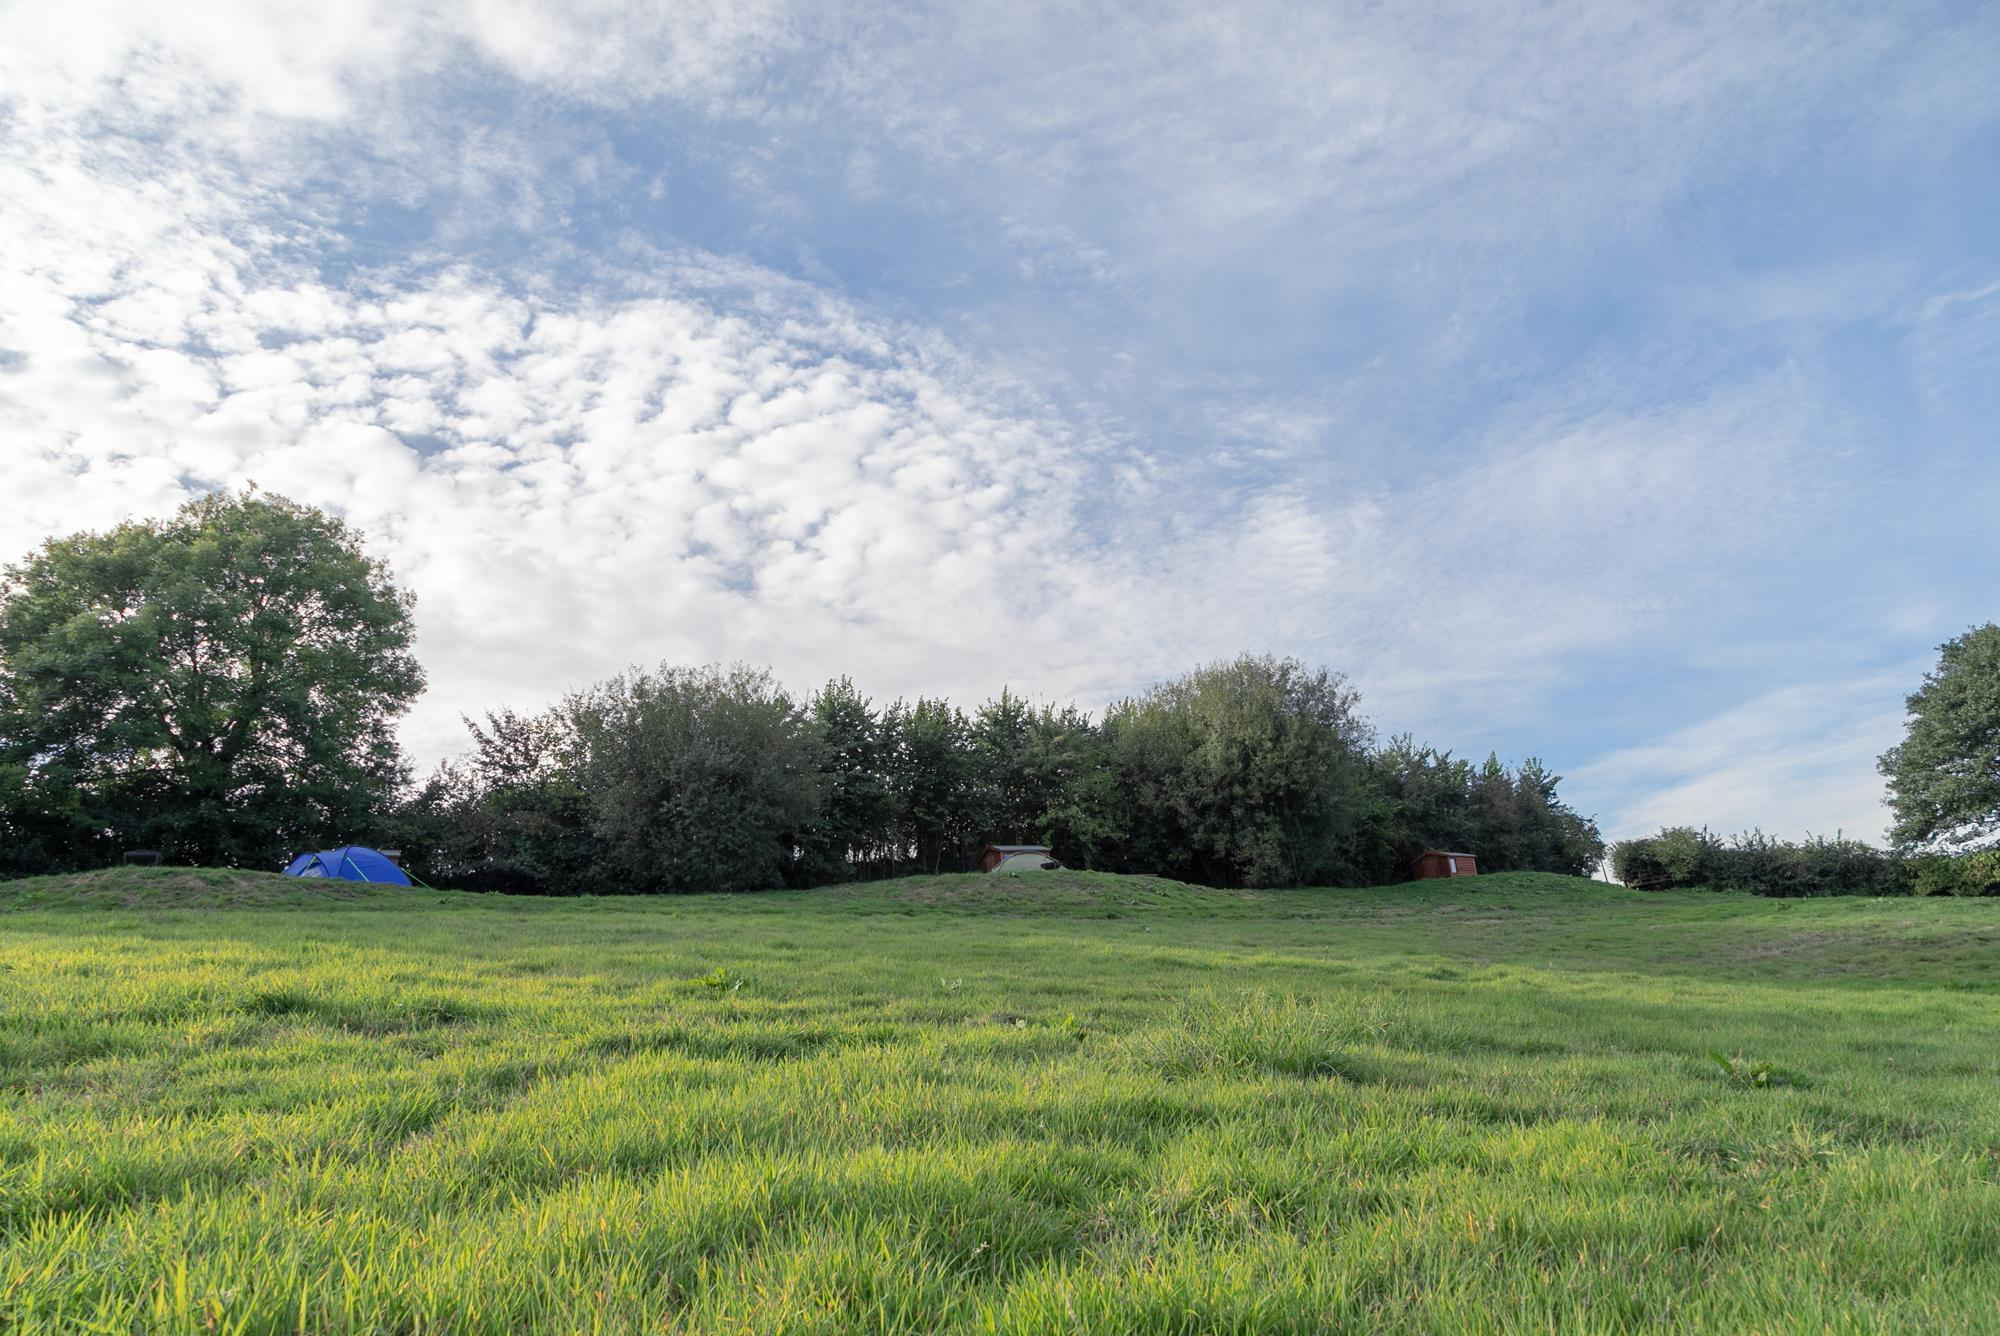 Taunton Camping   Best campsites in Taunton, Somerset